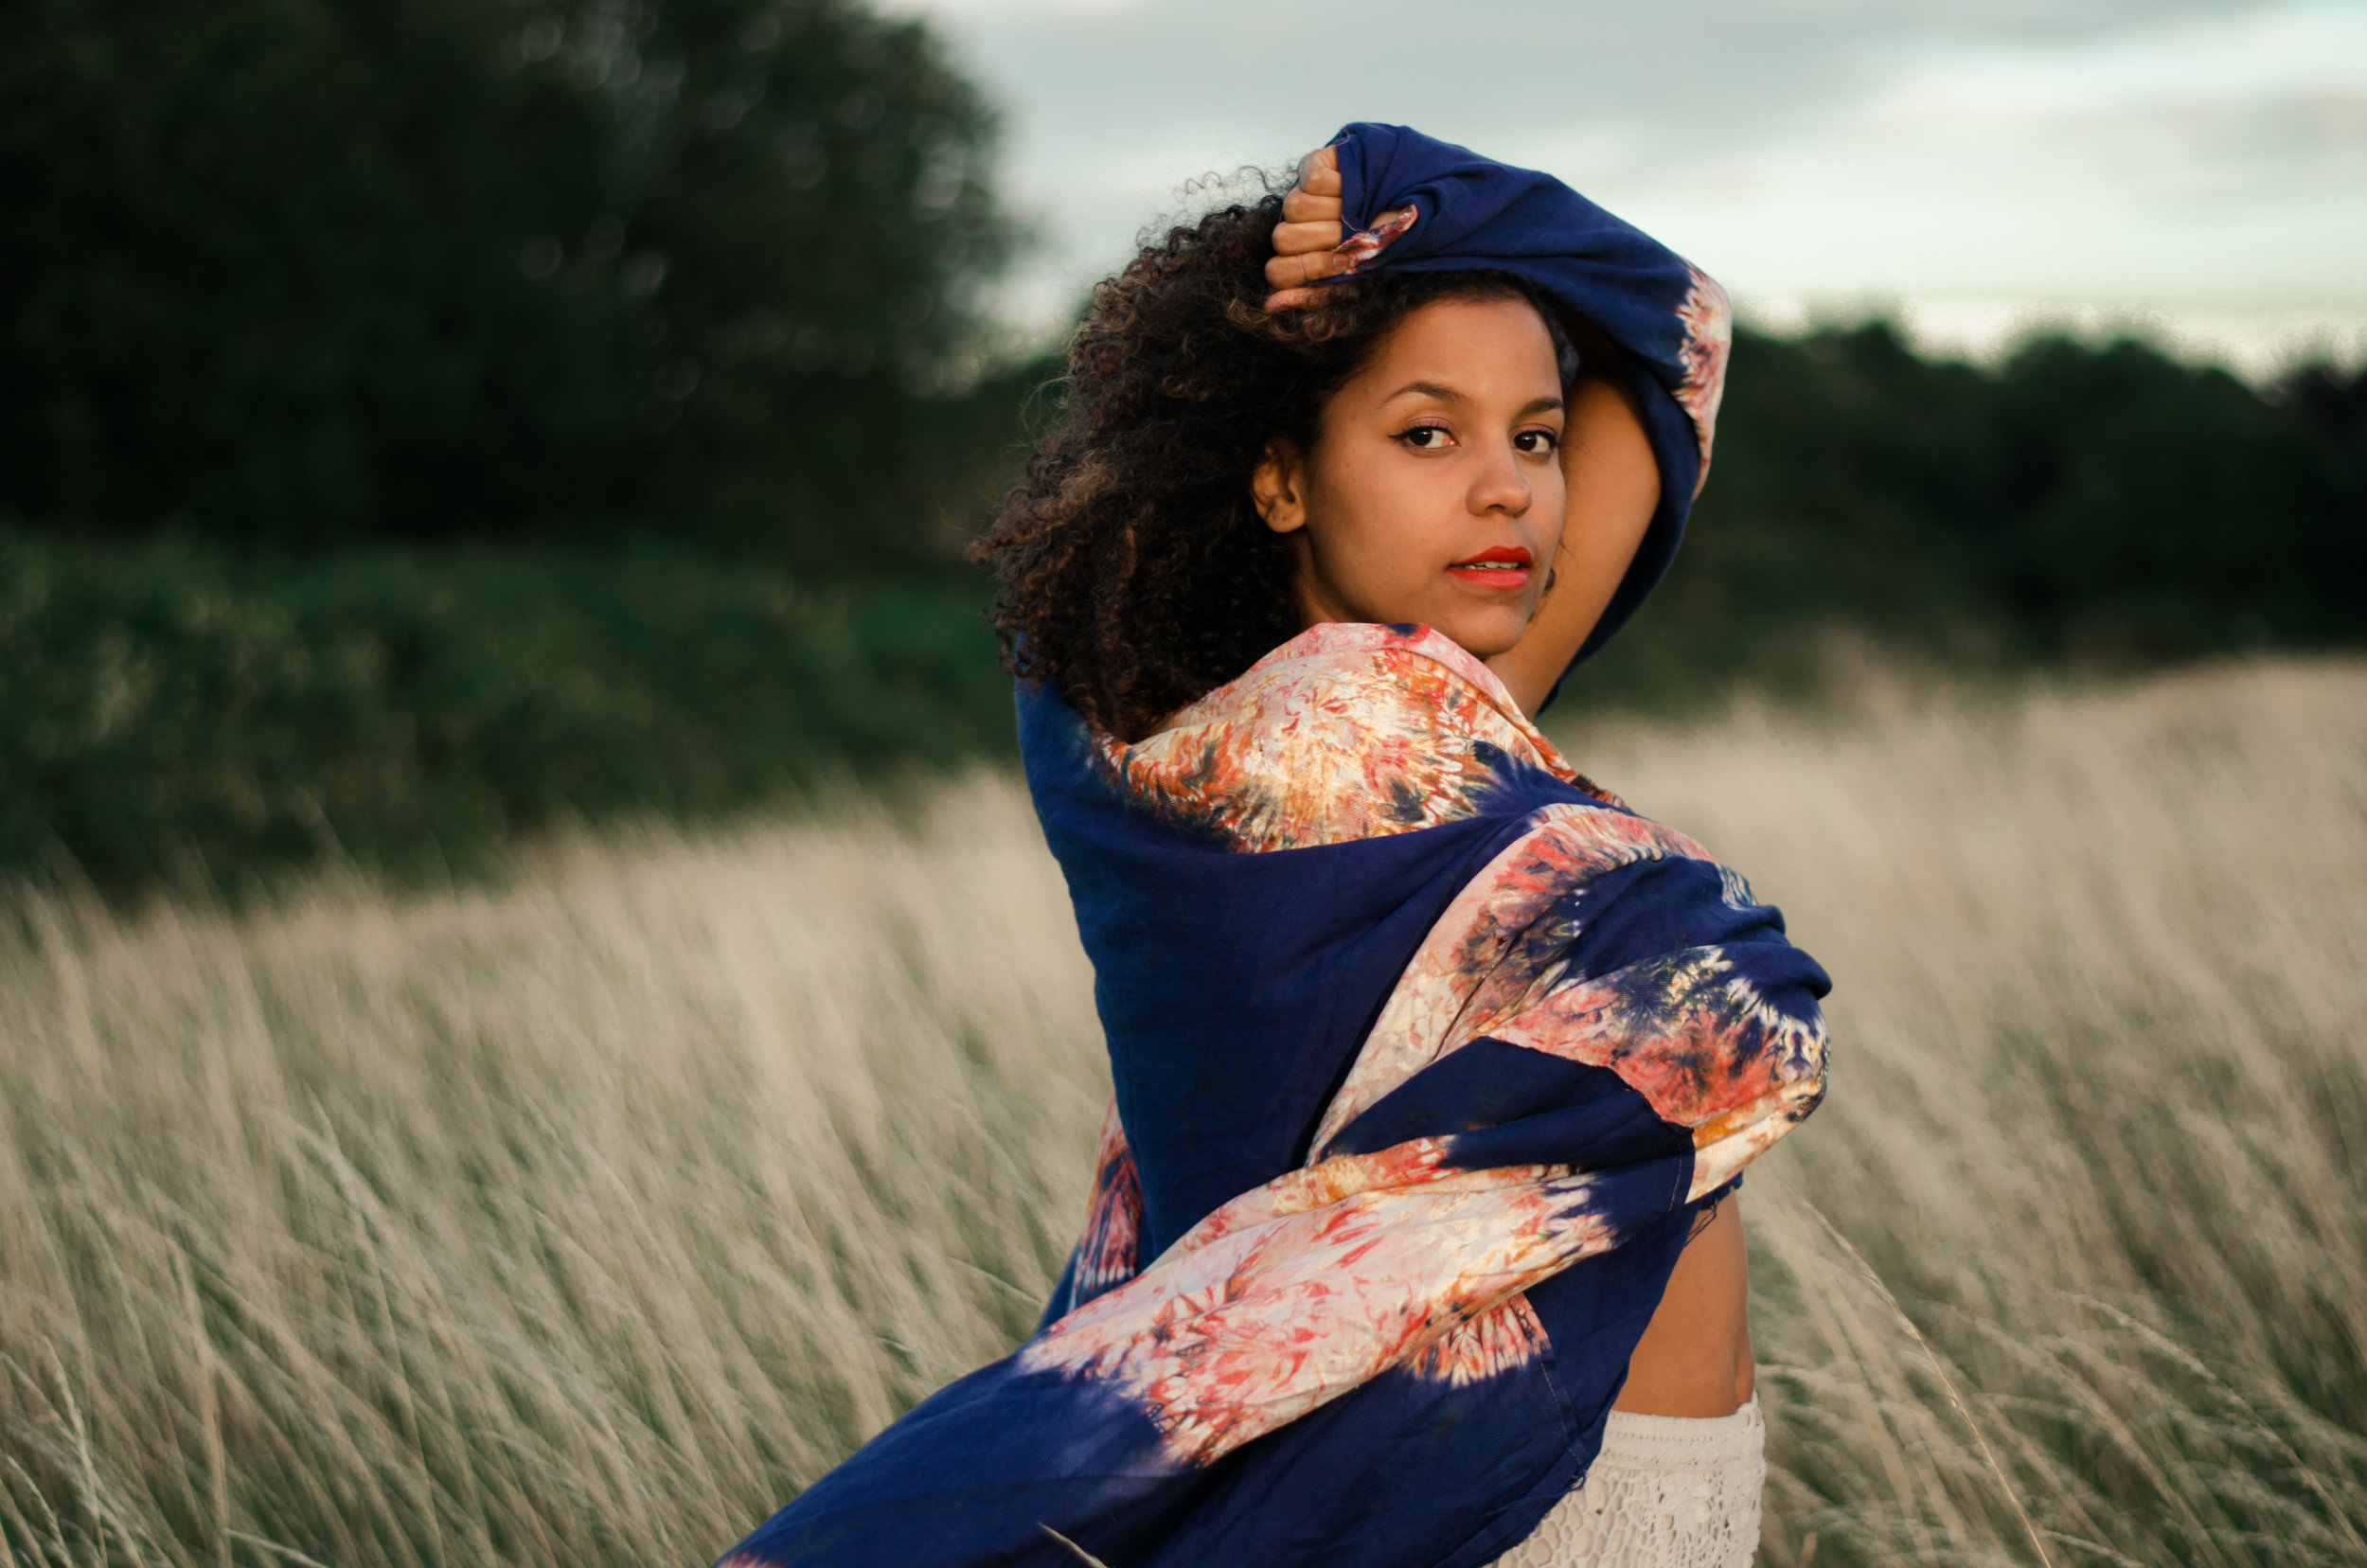 Inka-Portrait-Session-Aiste-Saulyte-Photography-17-07-30-454.jpg